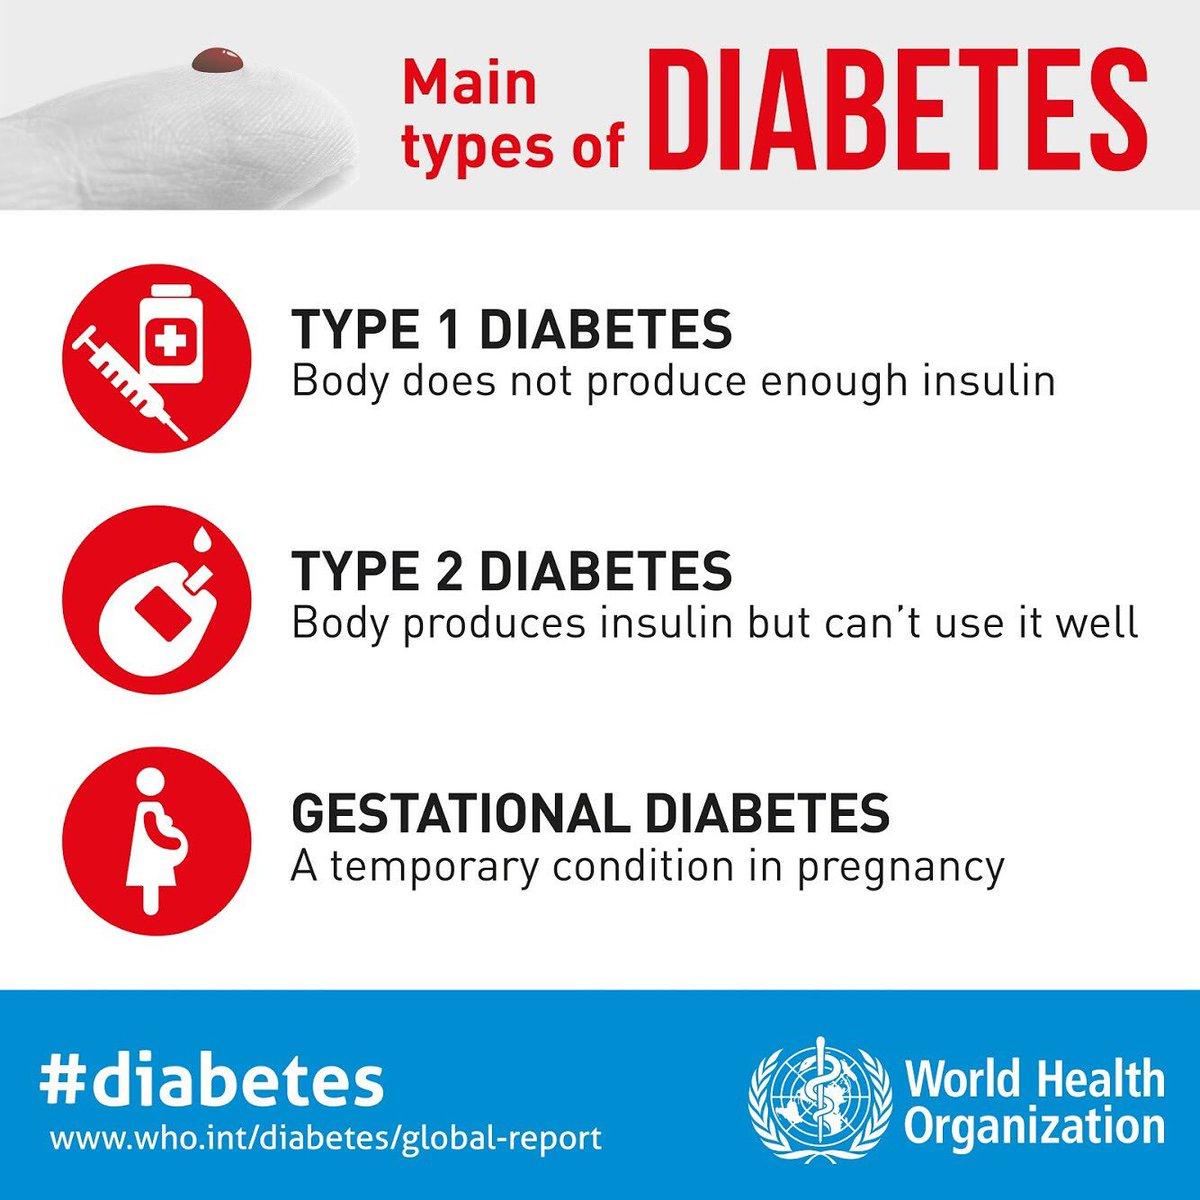 Main types of #diabetes: -Type 1 -Type 2 (vast majority of people with diabetes) -Gestational  http:// bit.ly/2zTcWSO  &nbsp;  <br>http://pic.twitter.com/sVkMZOkfWz